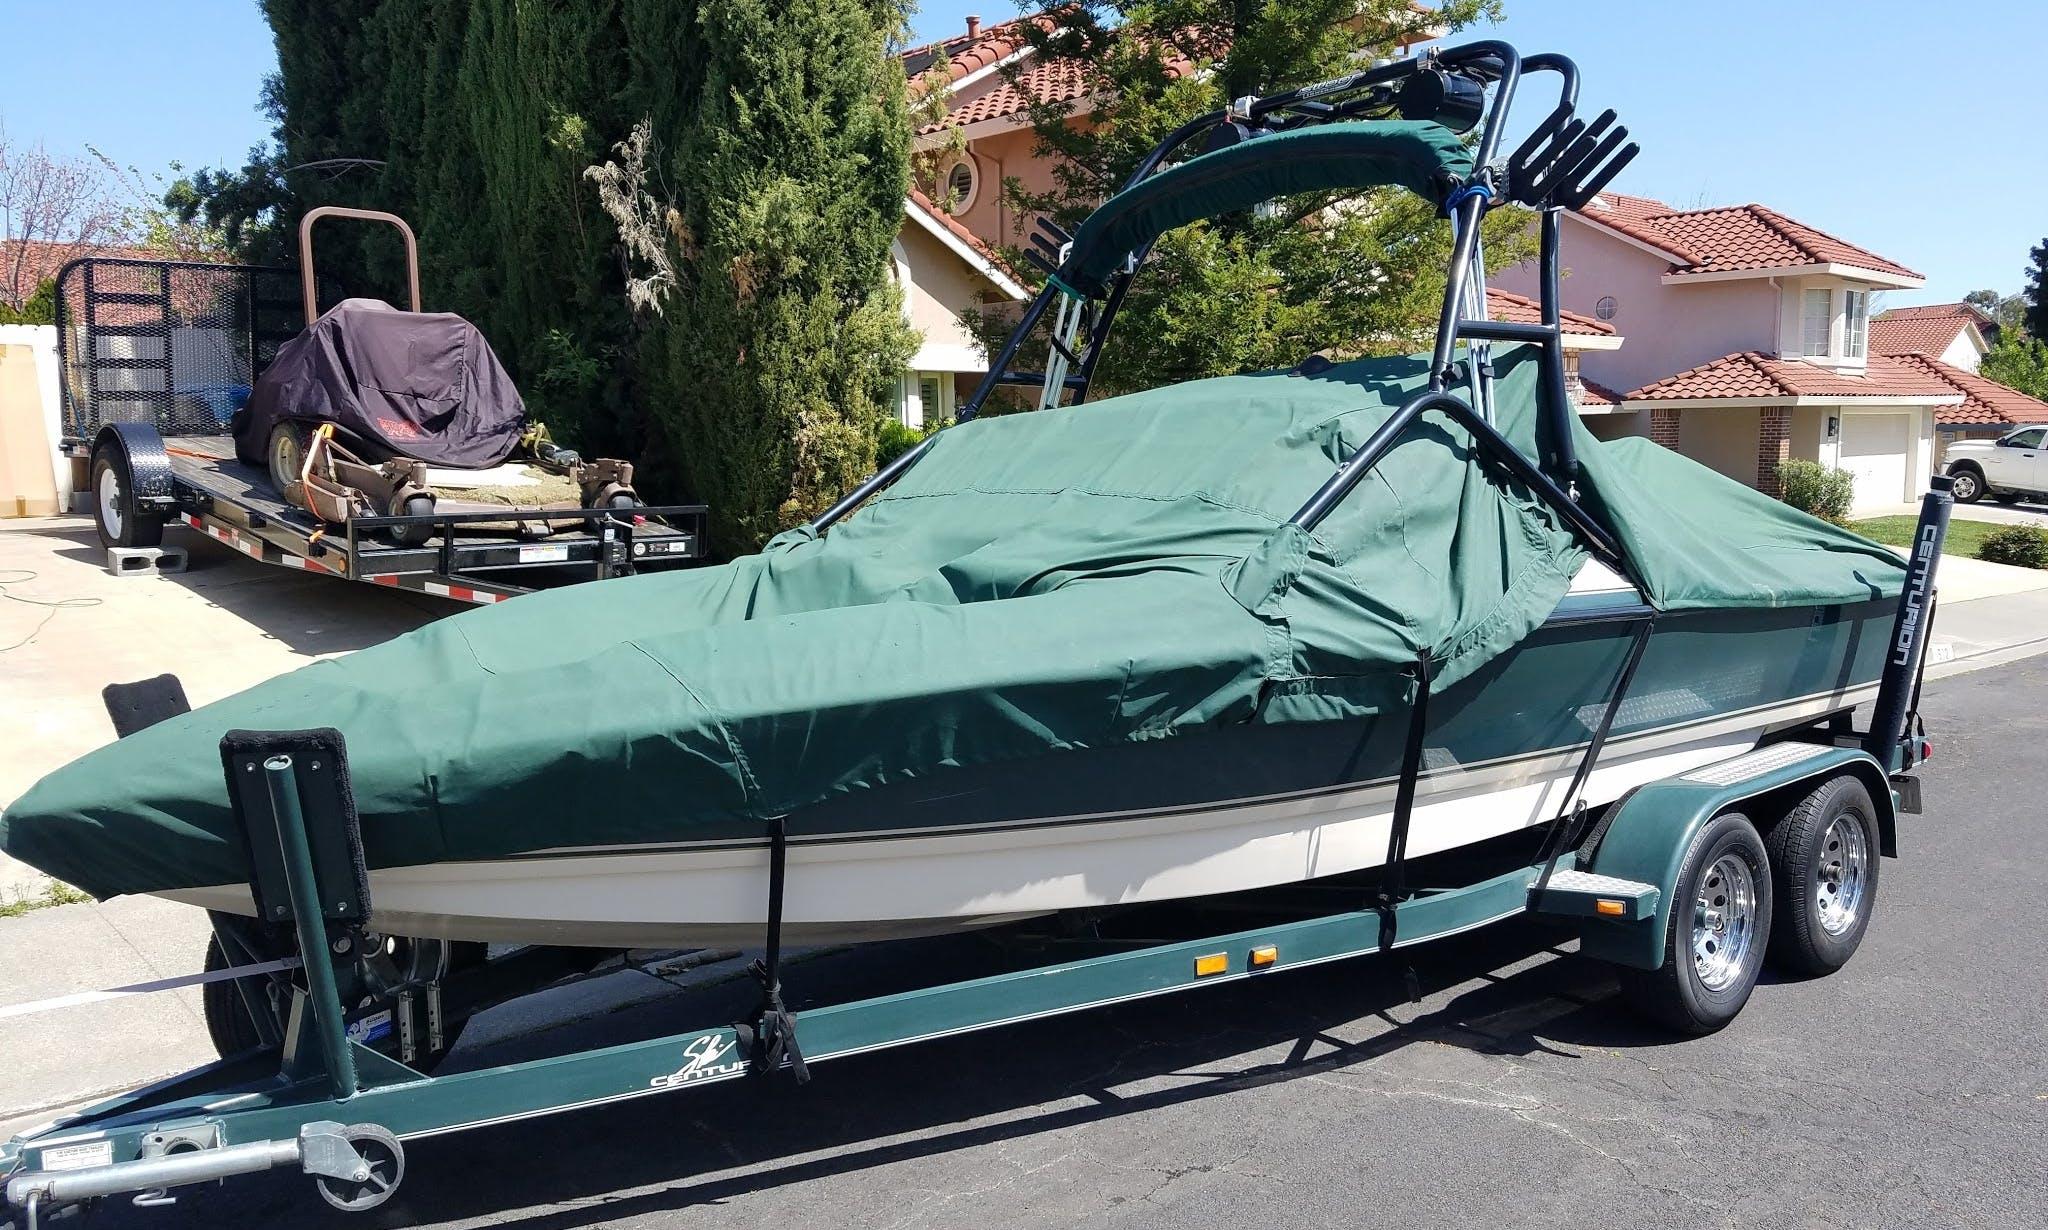 21' Ski Centurion Bowrider rental in Rio Vista, California